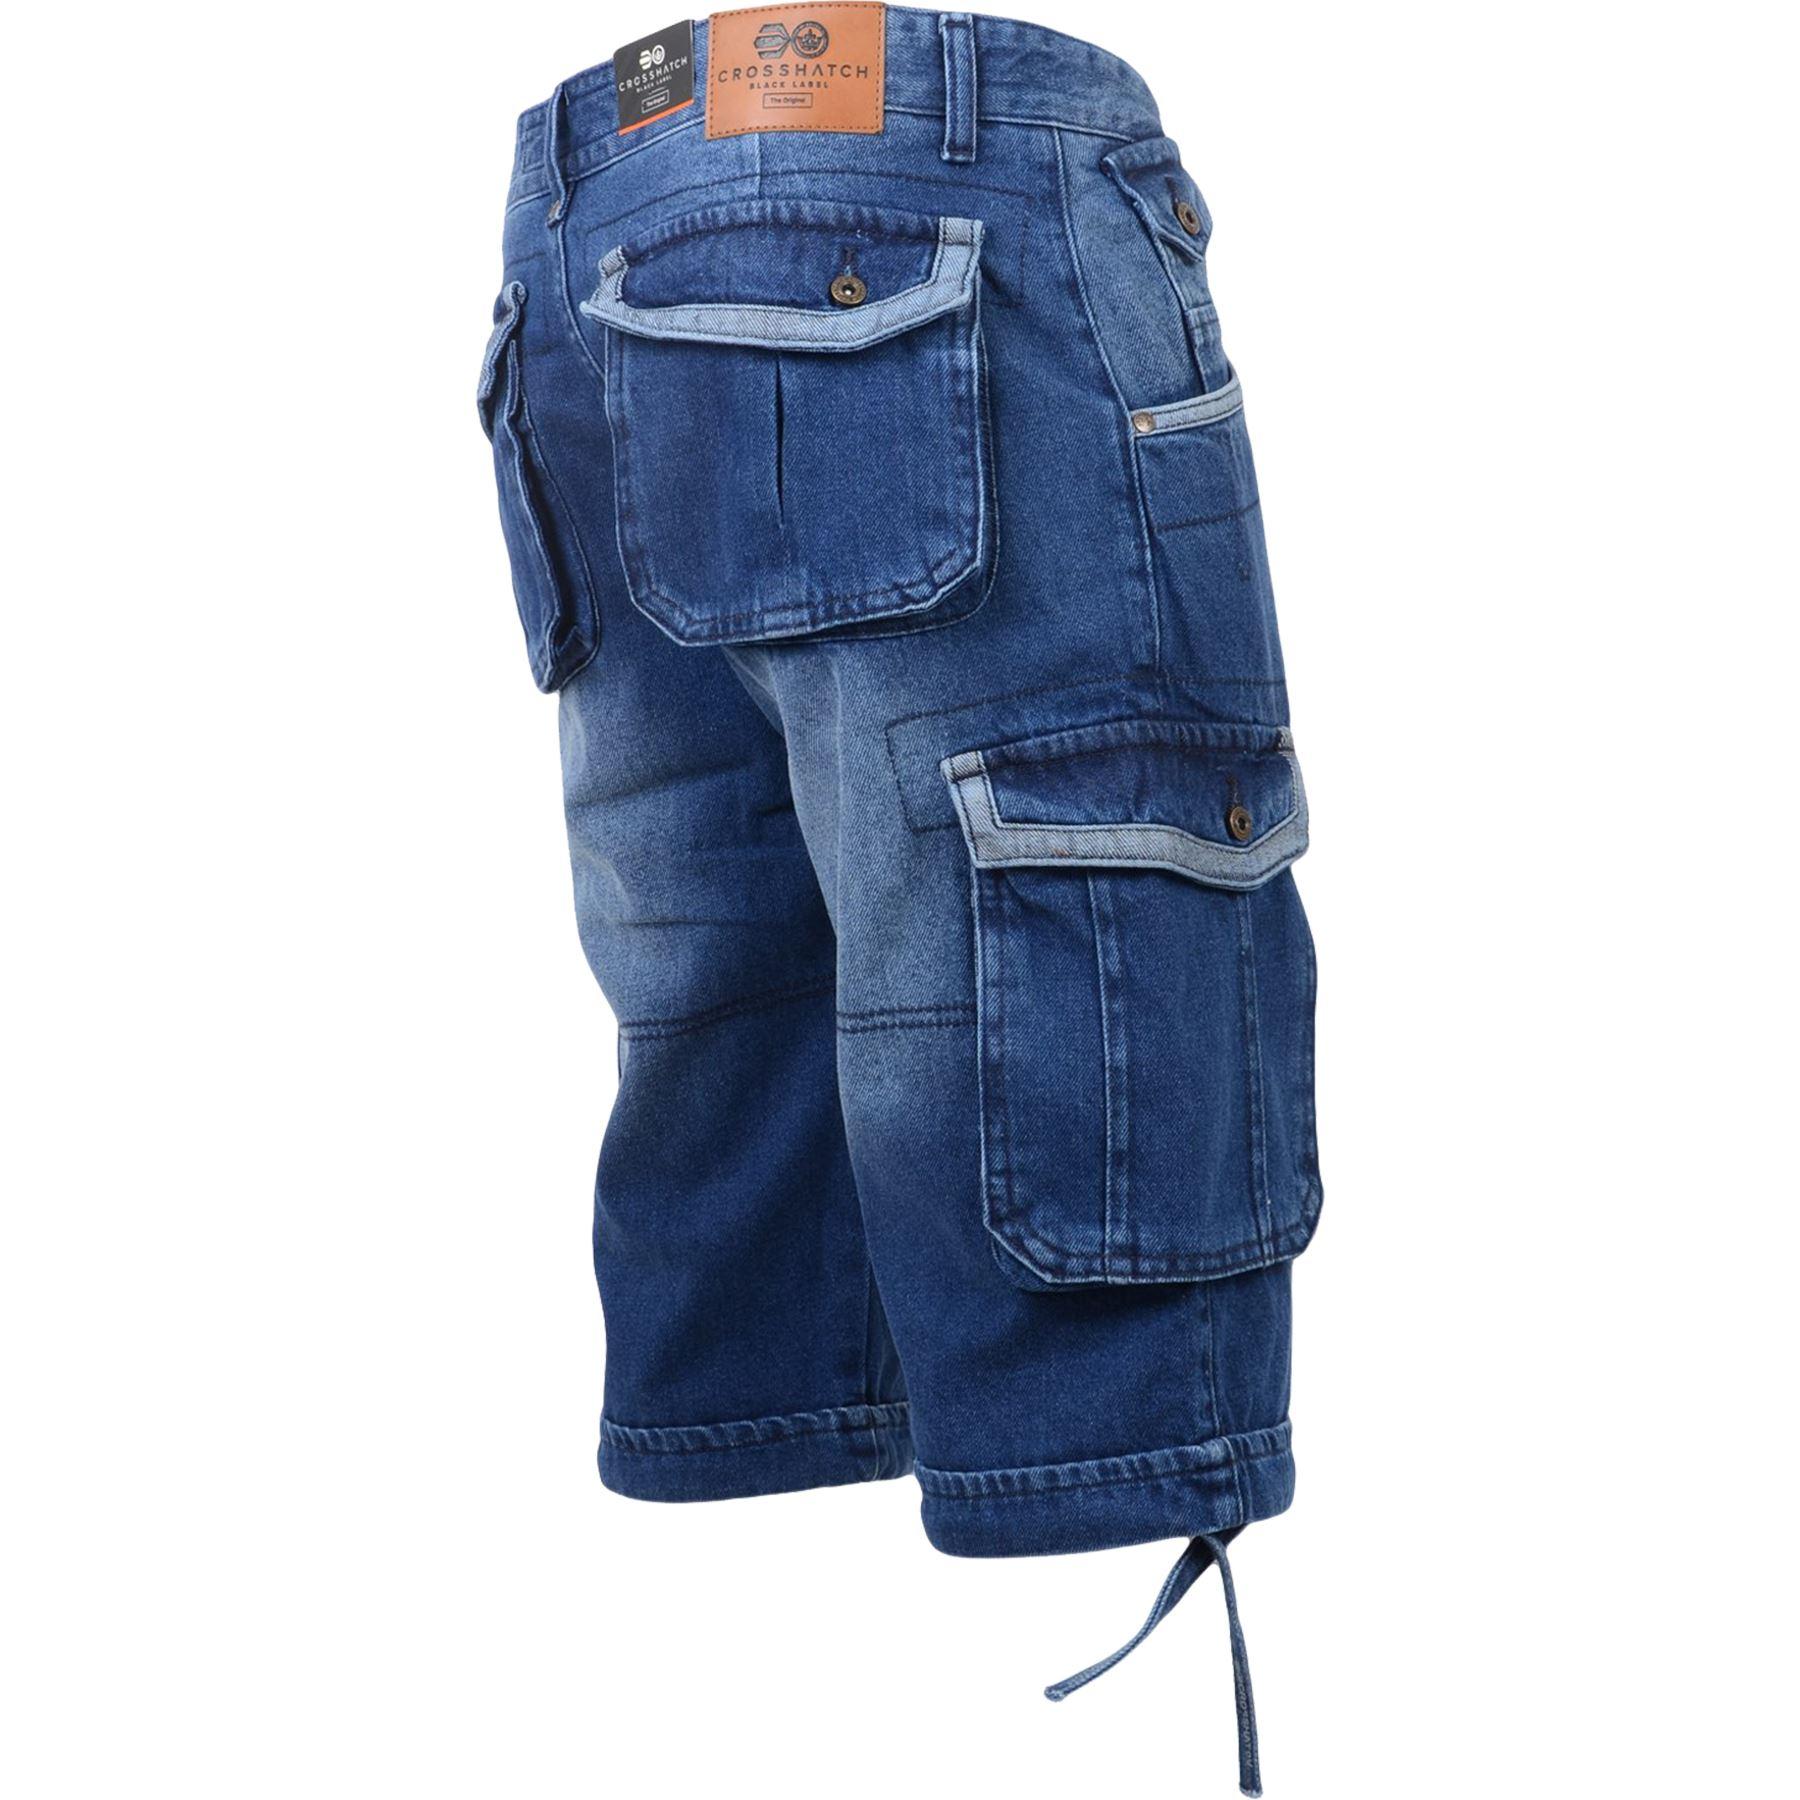 New-Mens-Crosshatch-Canvas-Cargo-Denim-Camo-Shorts-Chino-2019-Styles-30-42-034 thumbnail 33